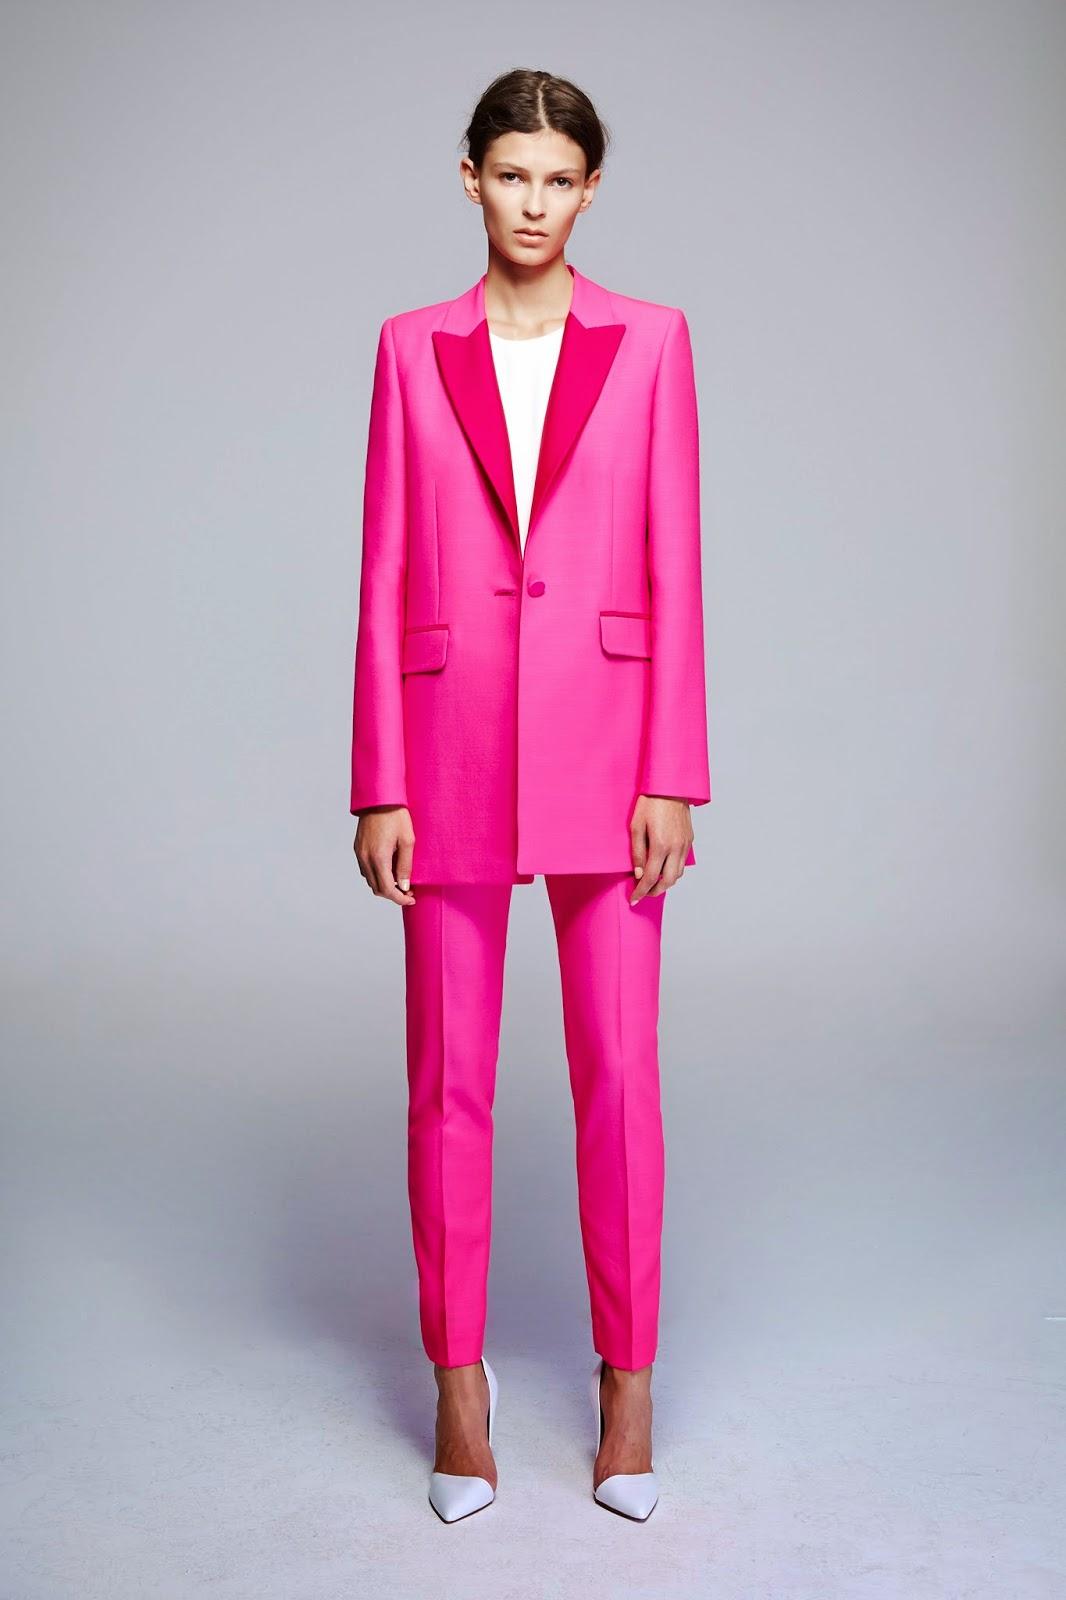 Womens pink blazer jacket